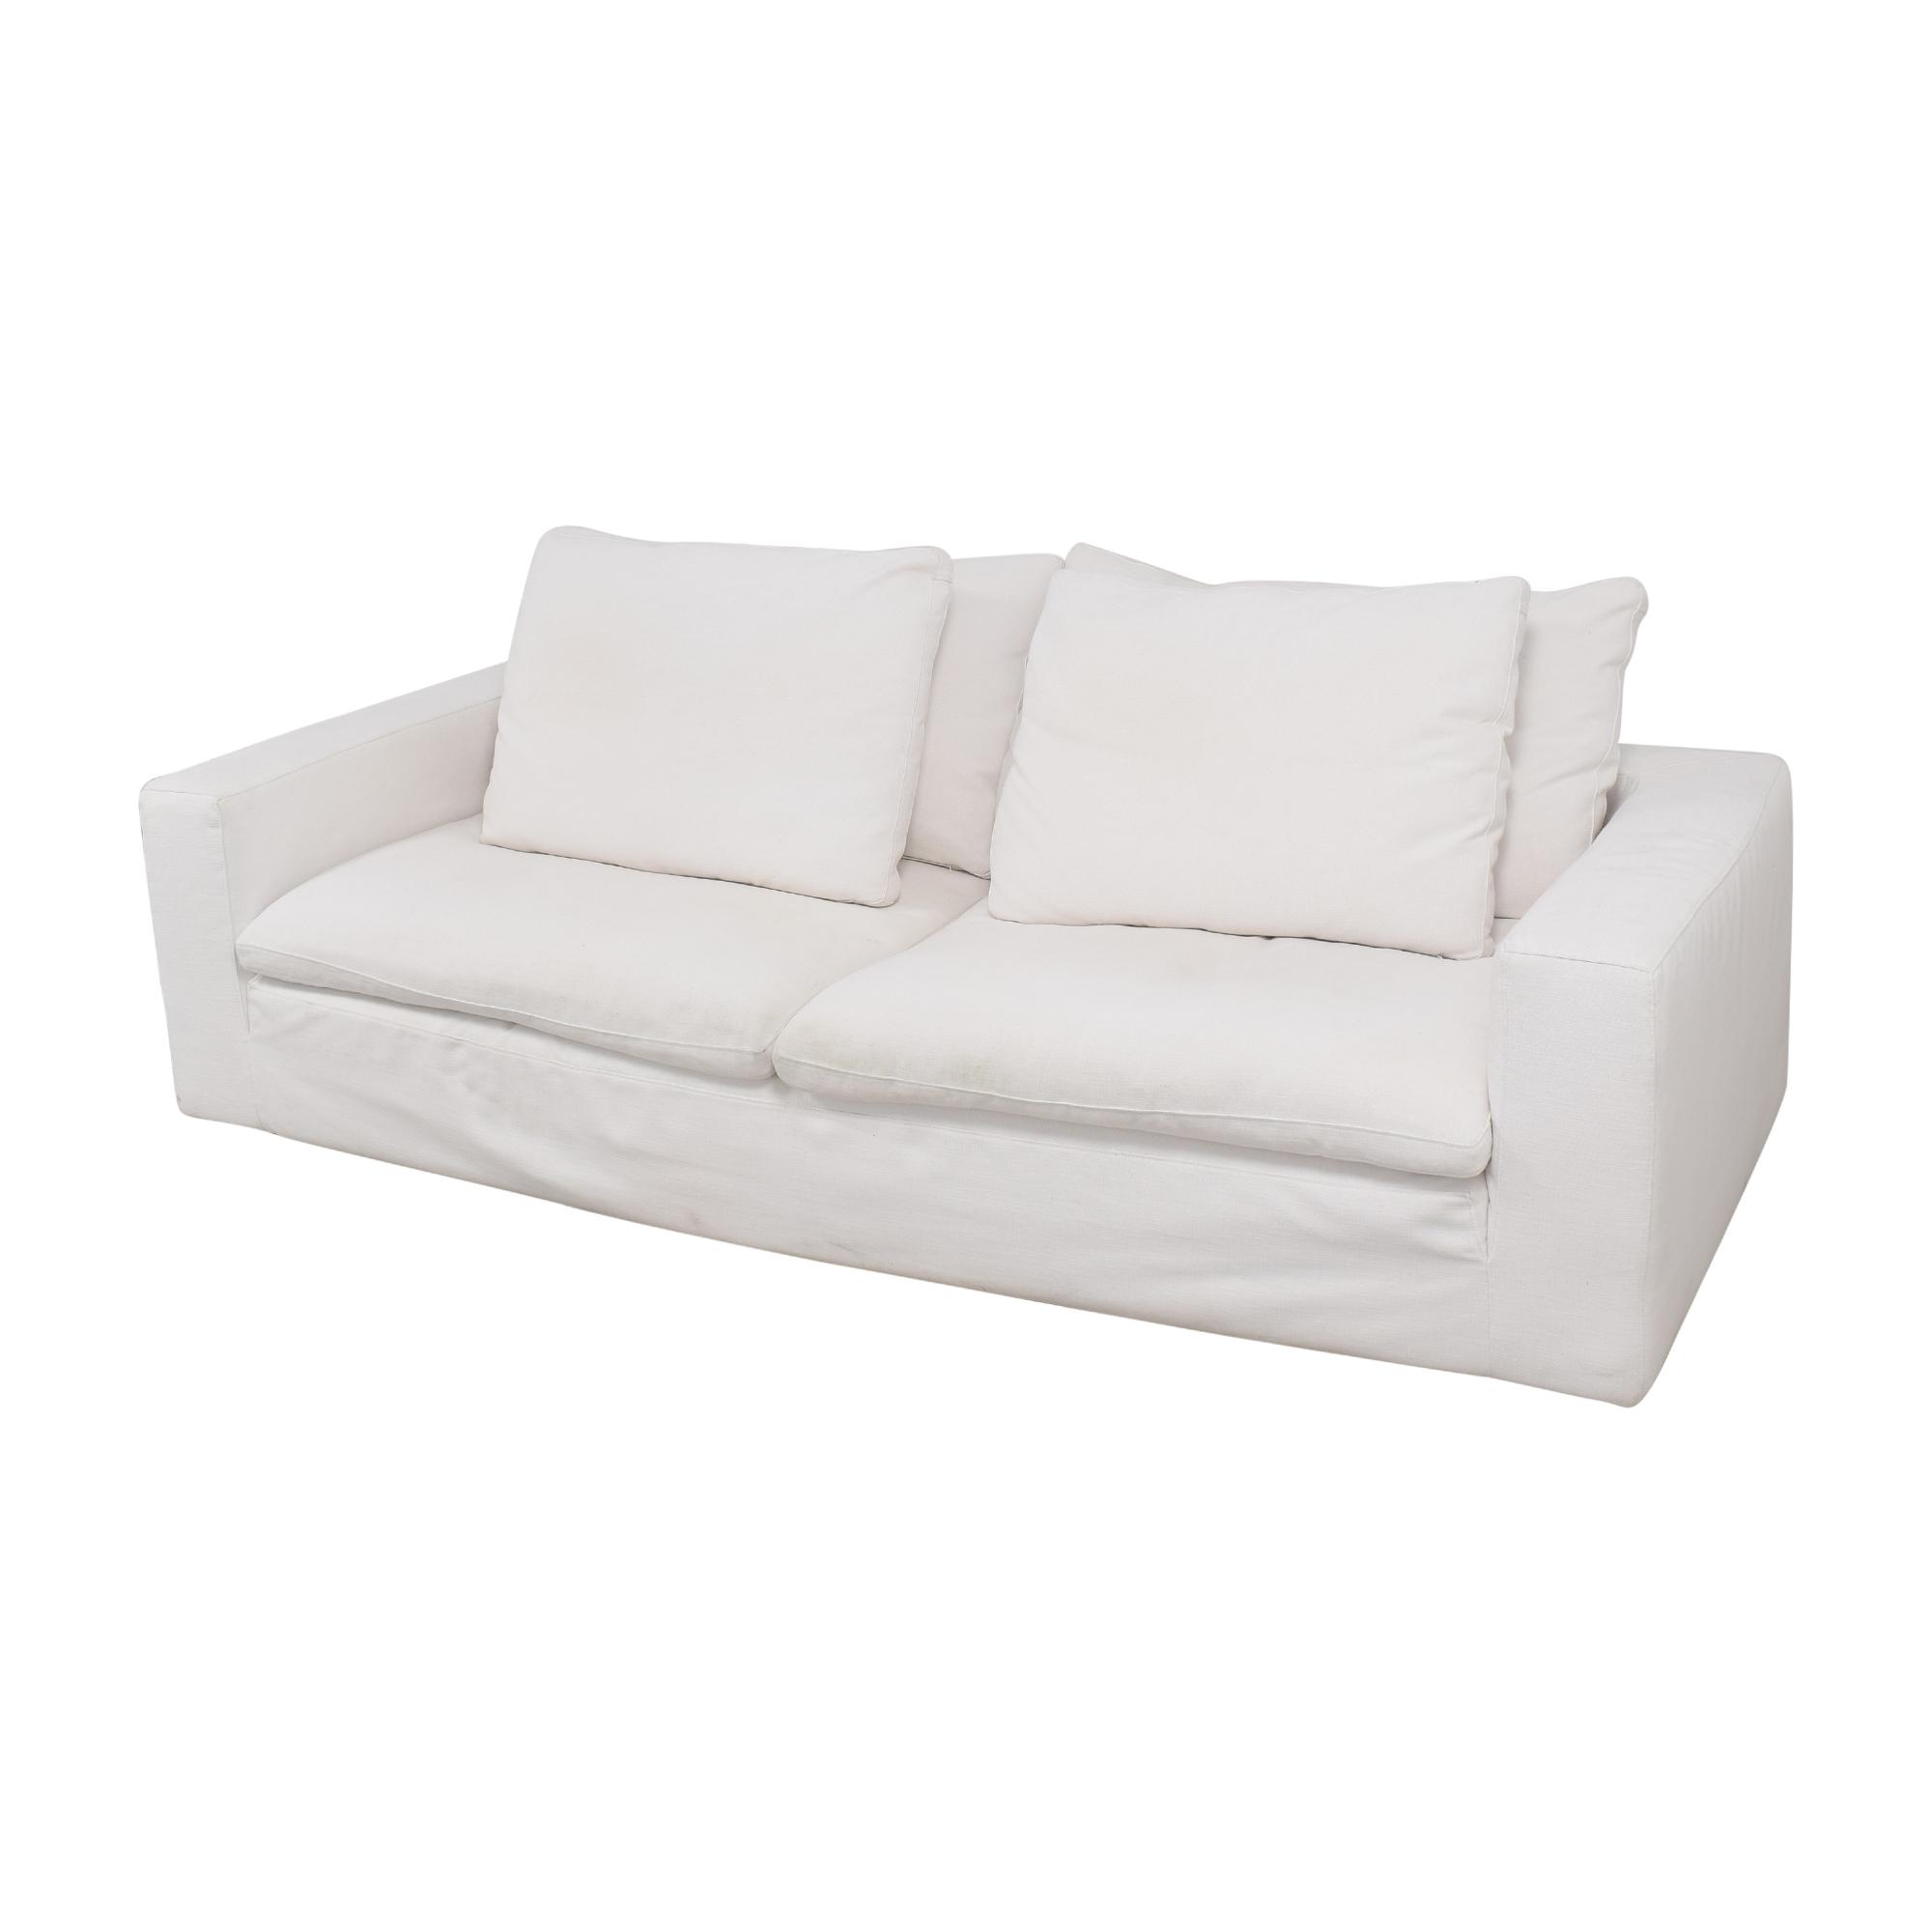 shop Restoration Hardware Cloud Two-Seat-Cushion Sofa Restoration Hardware Classic Sofas